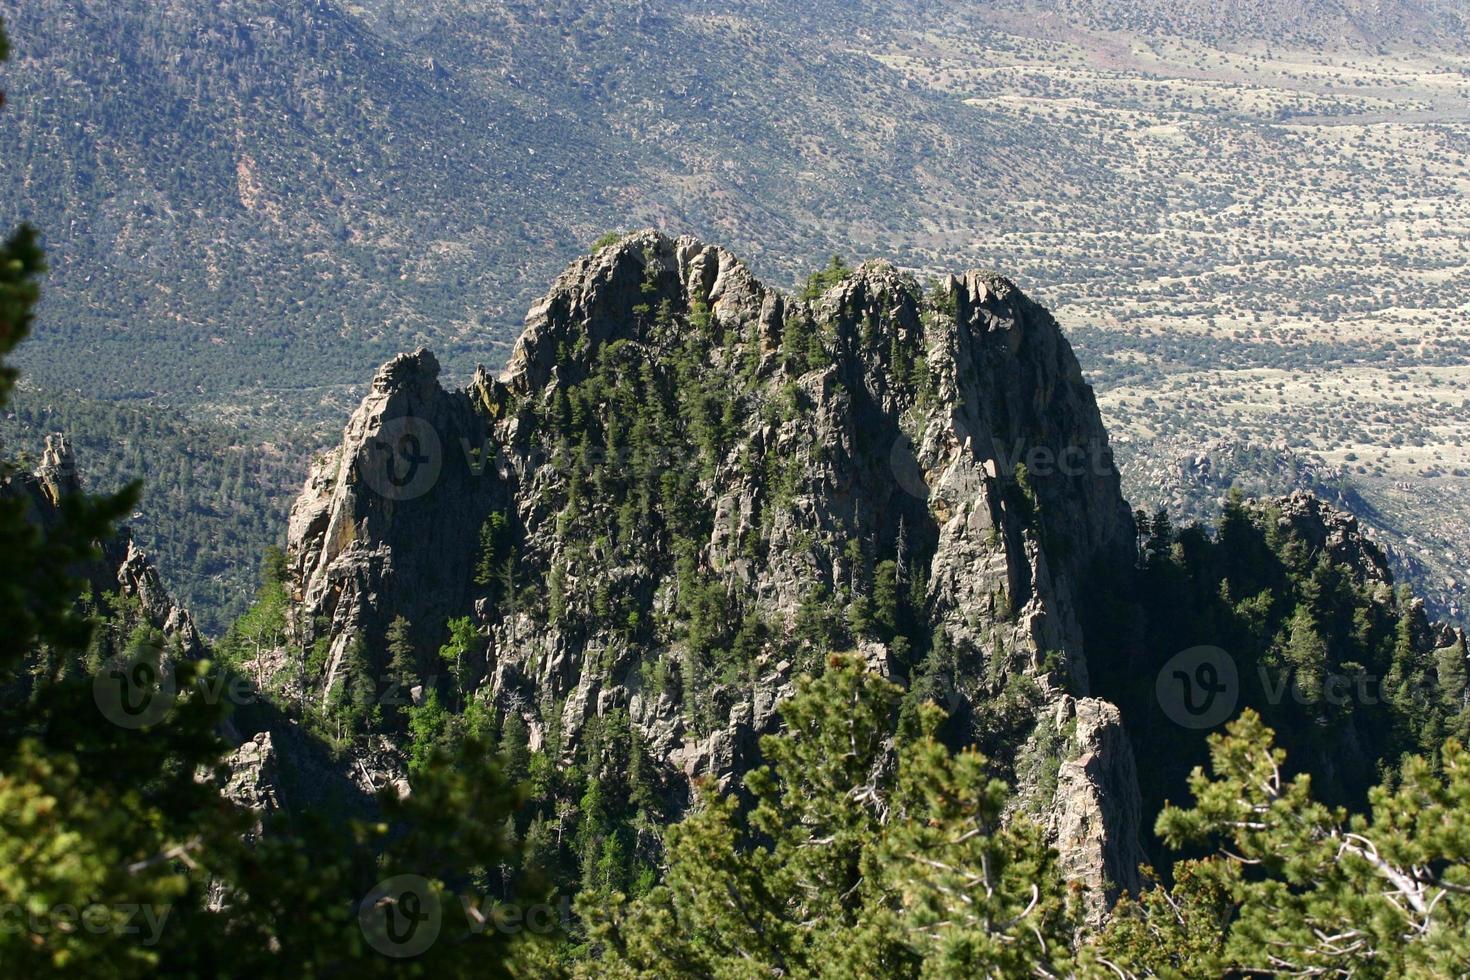 montagne frastagliate foto